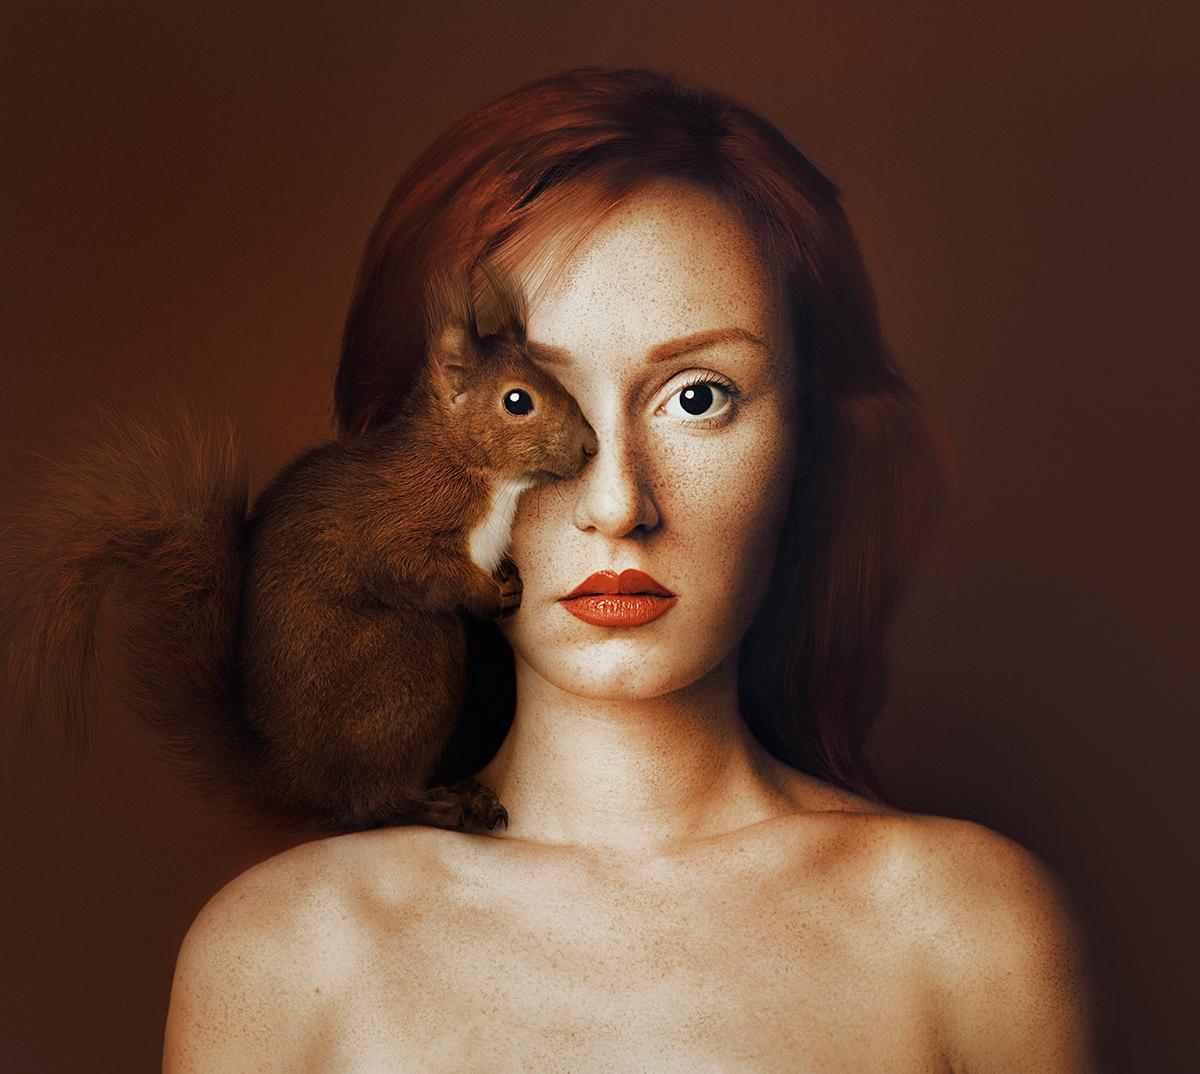 animals eyes photomanipulation photoshop fine art conceptual surreal